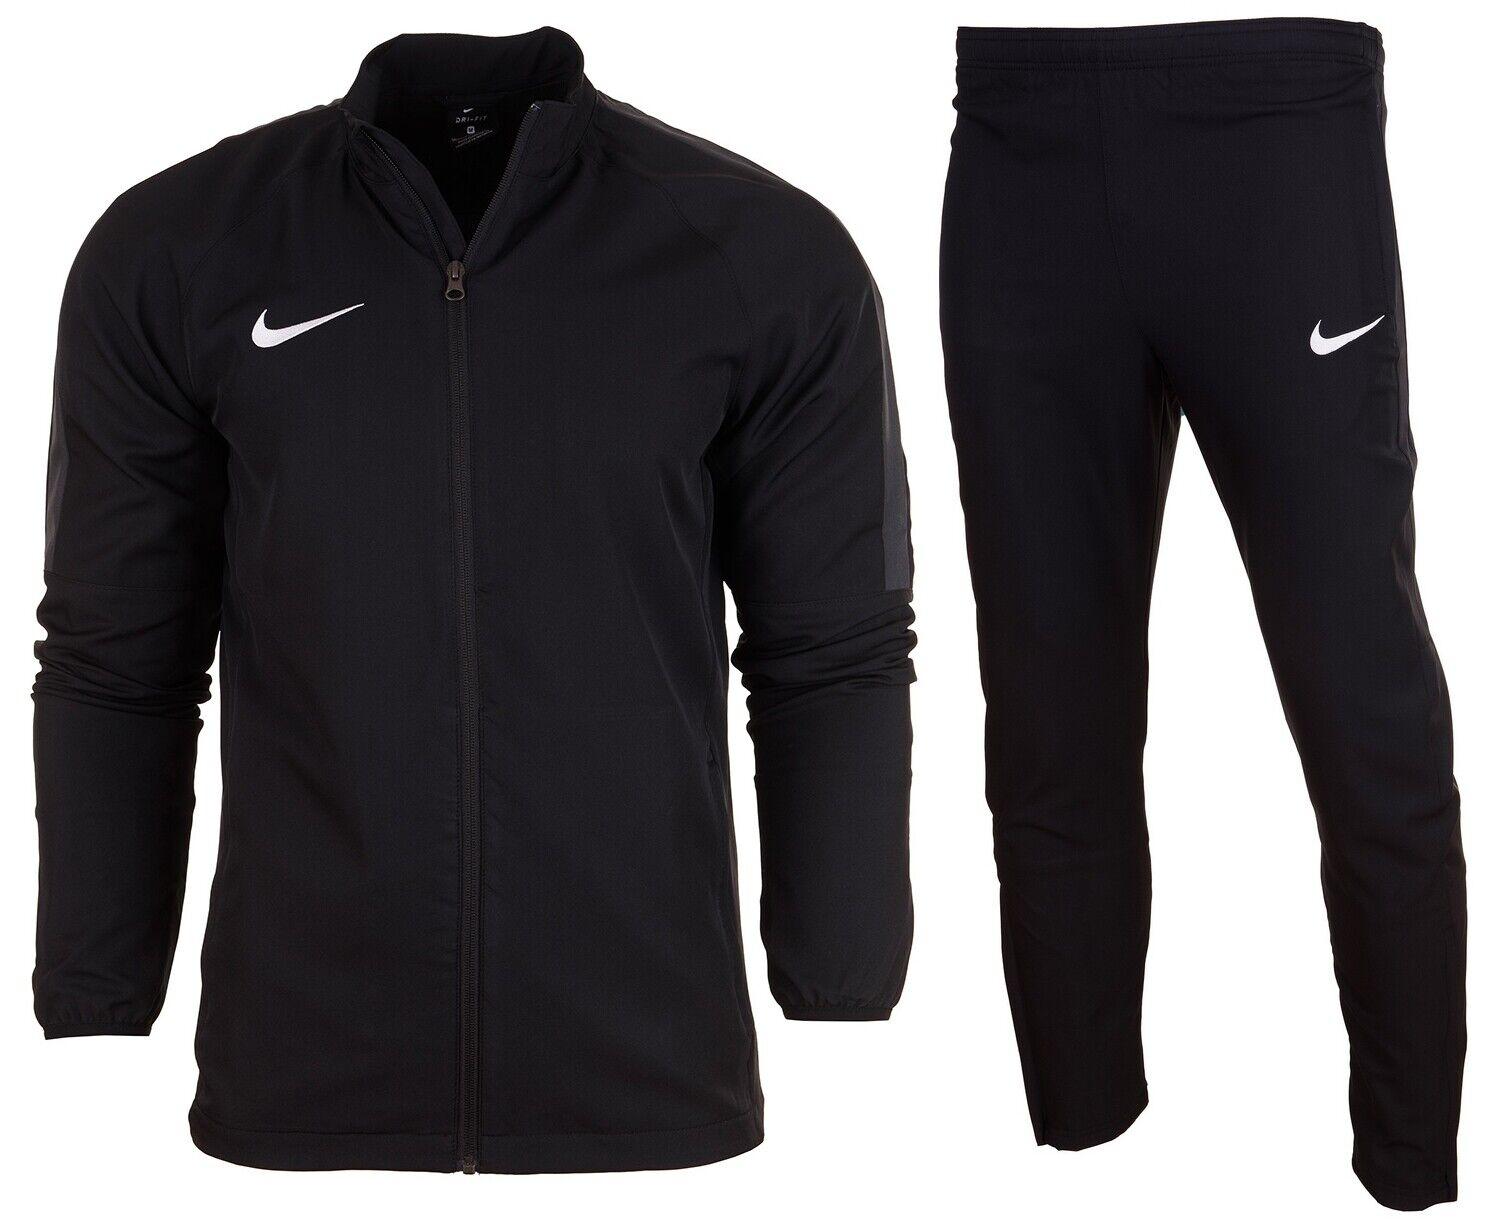 44738dce615dc NEUE Modell Nike Academy 18 Herren Fußball Trainingsanzug Sportanzug  893709-010